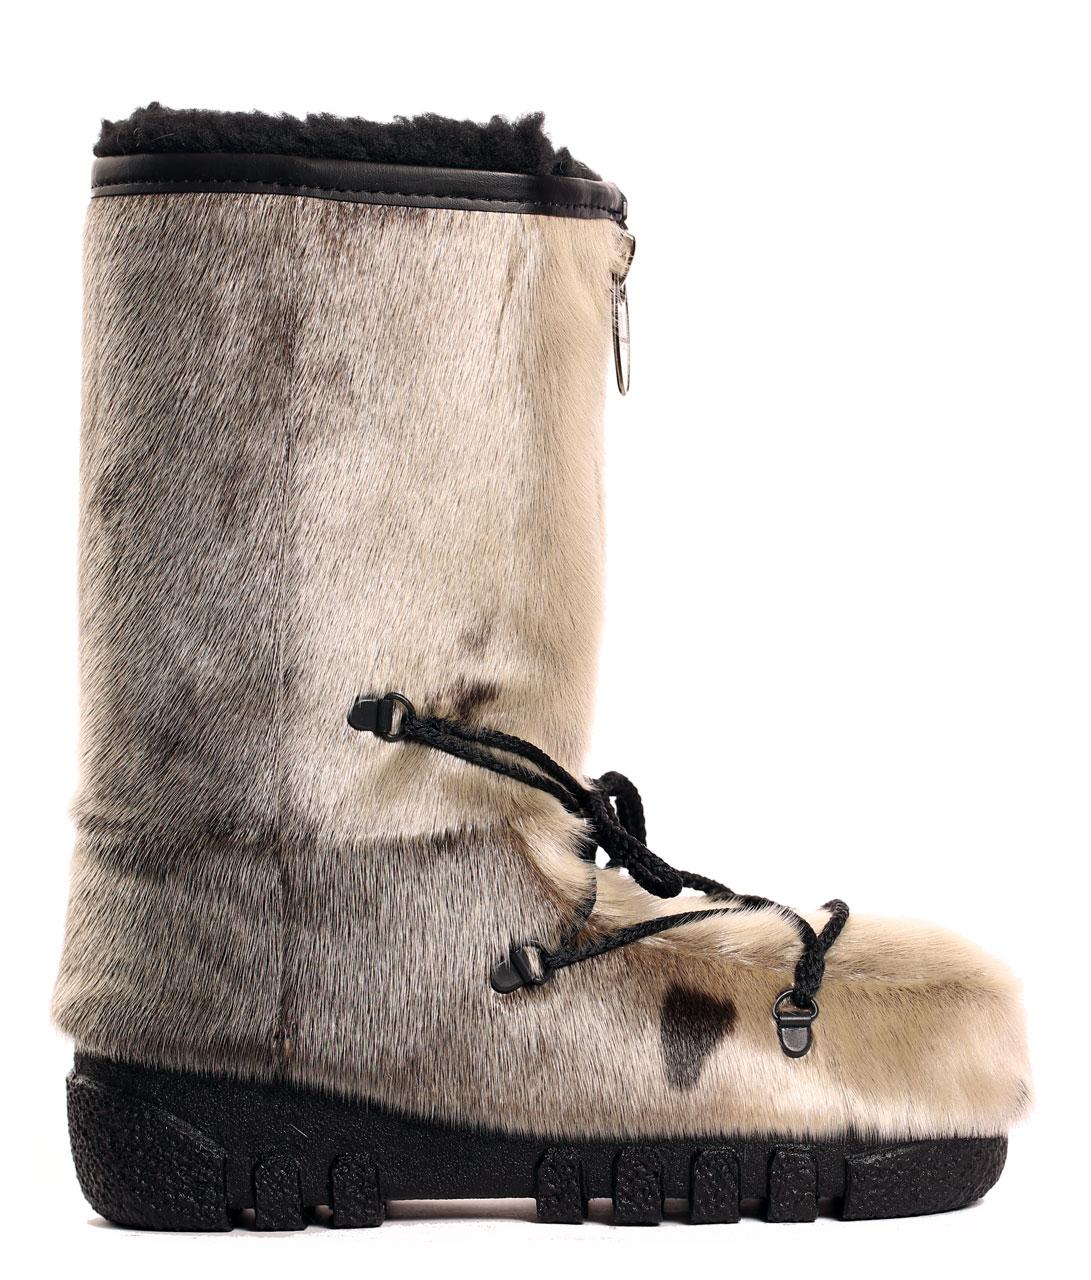 Natura Seal Fur Boots_Bilodeau Canada